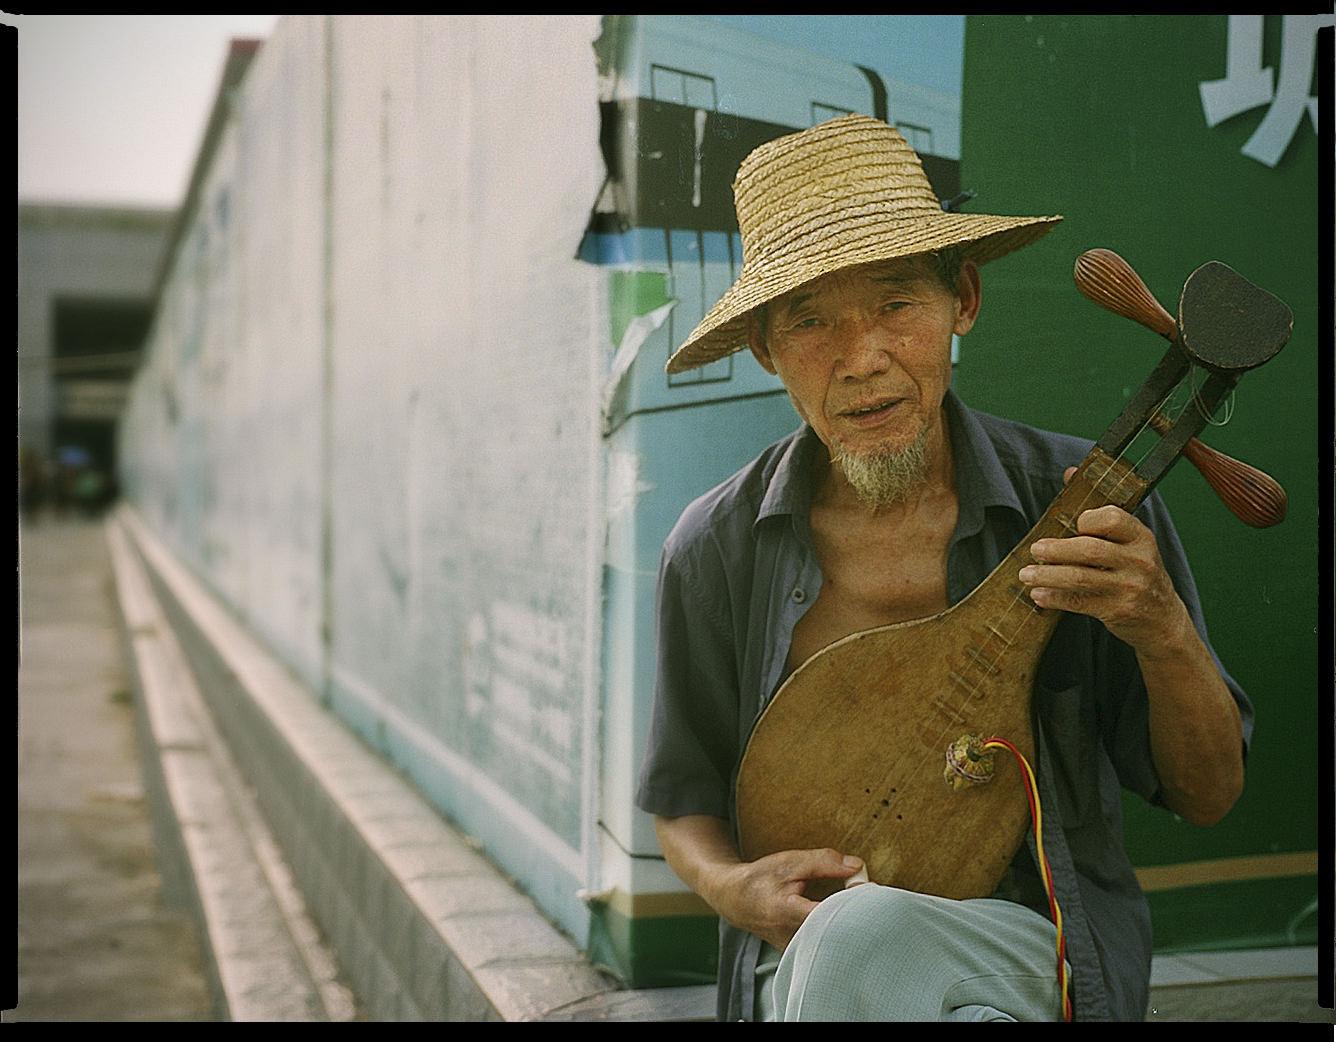 MediumFormatPatrikWallner_Shenzhen_MusicanLOWQ